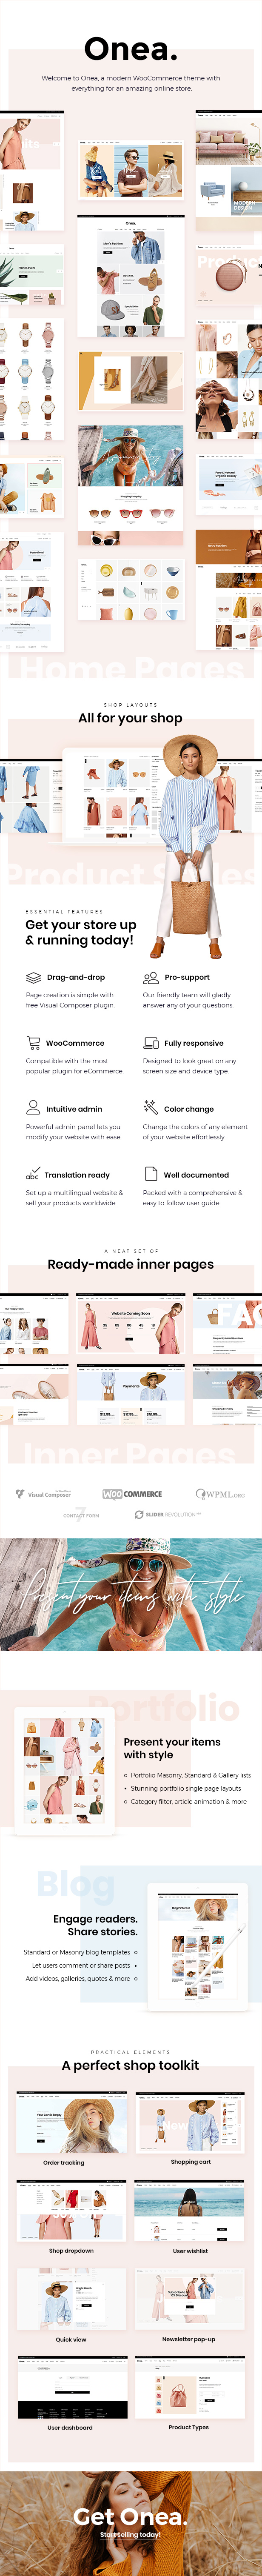 Onea - Multipurpose WooCommerce Theme - 1